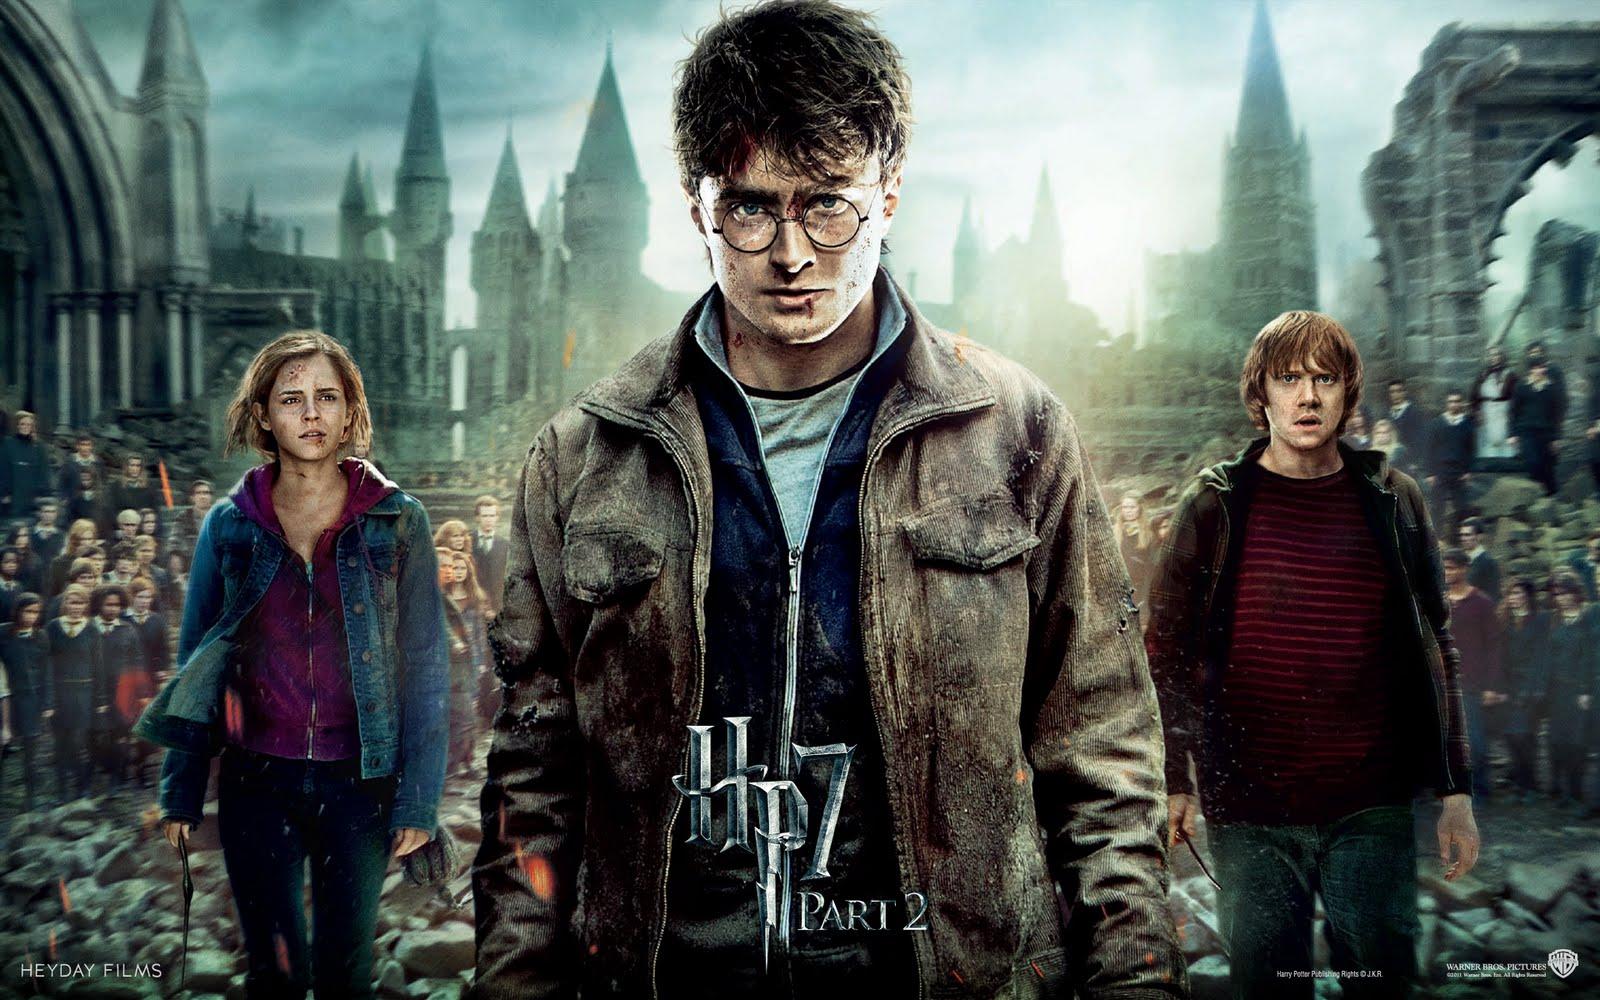 http://3.bp.blogspot.com/-_4Ul9bbcVcE/TigExEvEELI/AAAAAAAABKM/atLf2ioNhe0/s1600/Harry-Potter-and-the-Deathly-Hallows-Part-2-Wallpaper-HD-1.jpg